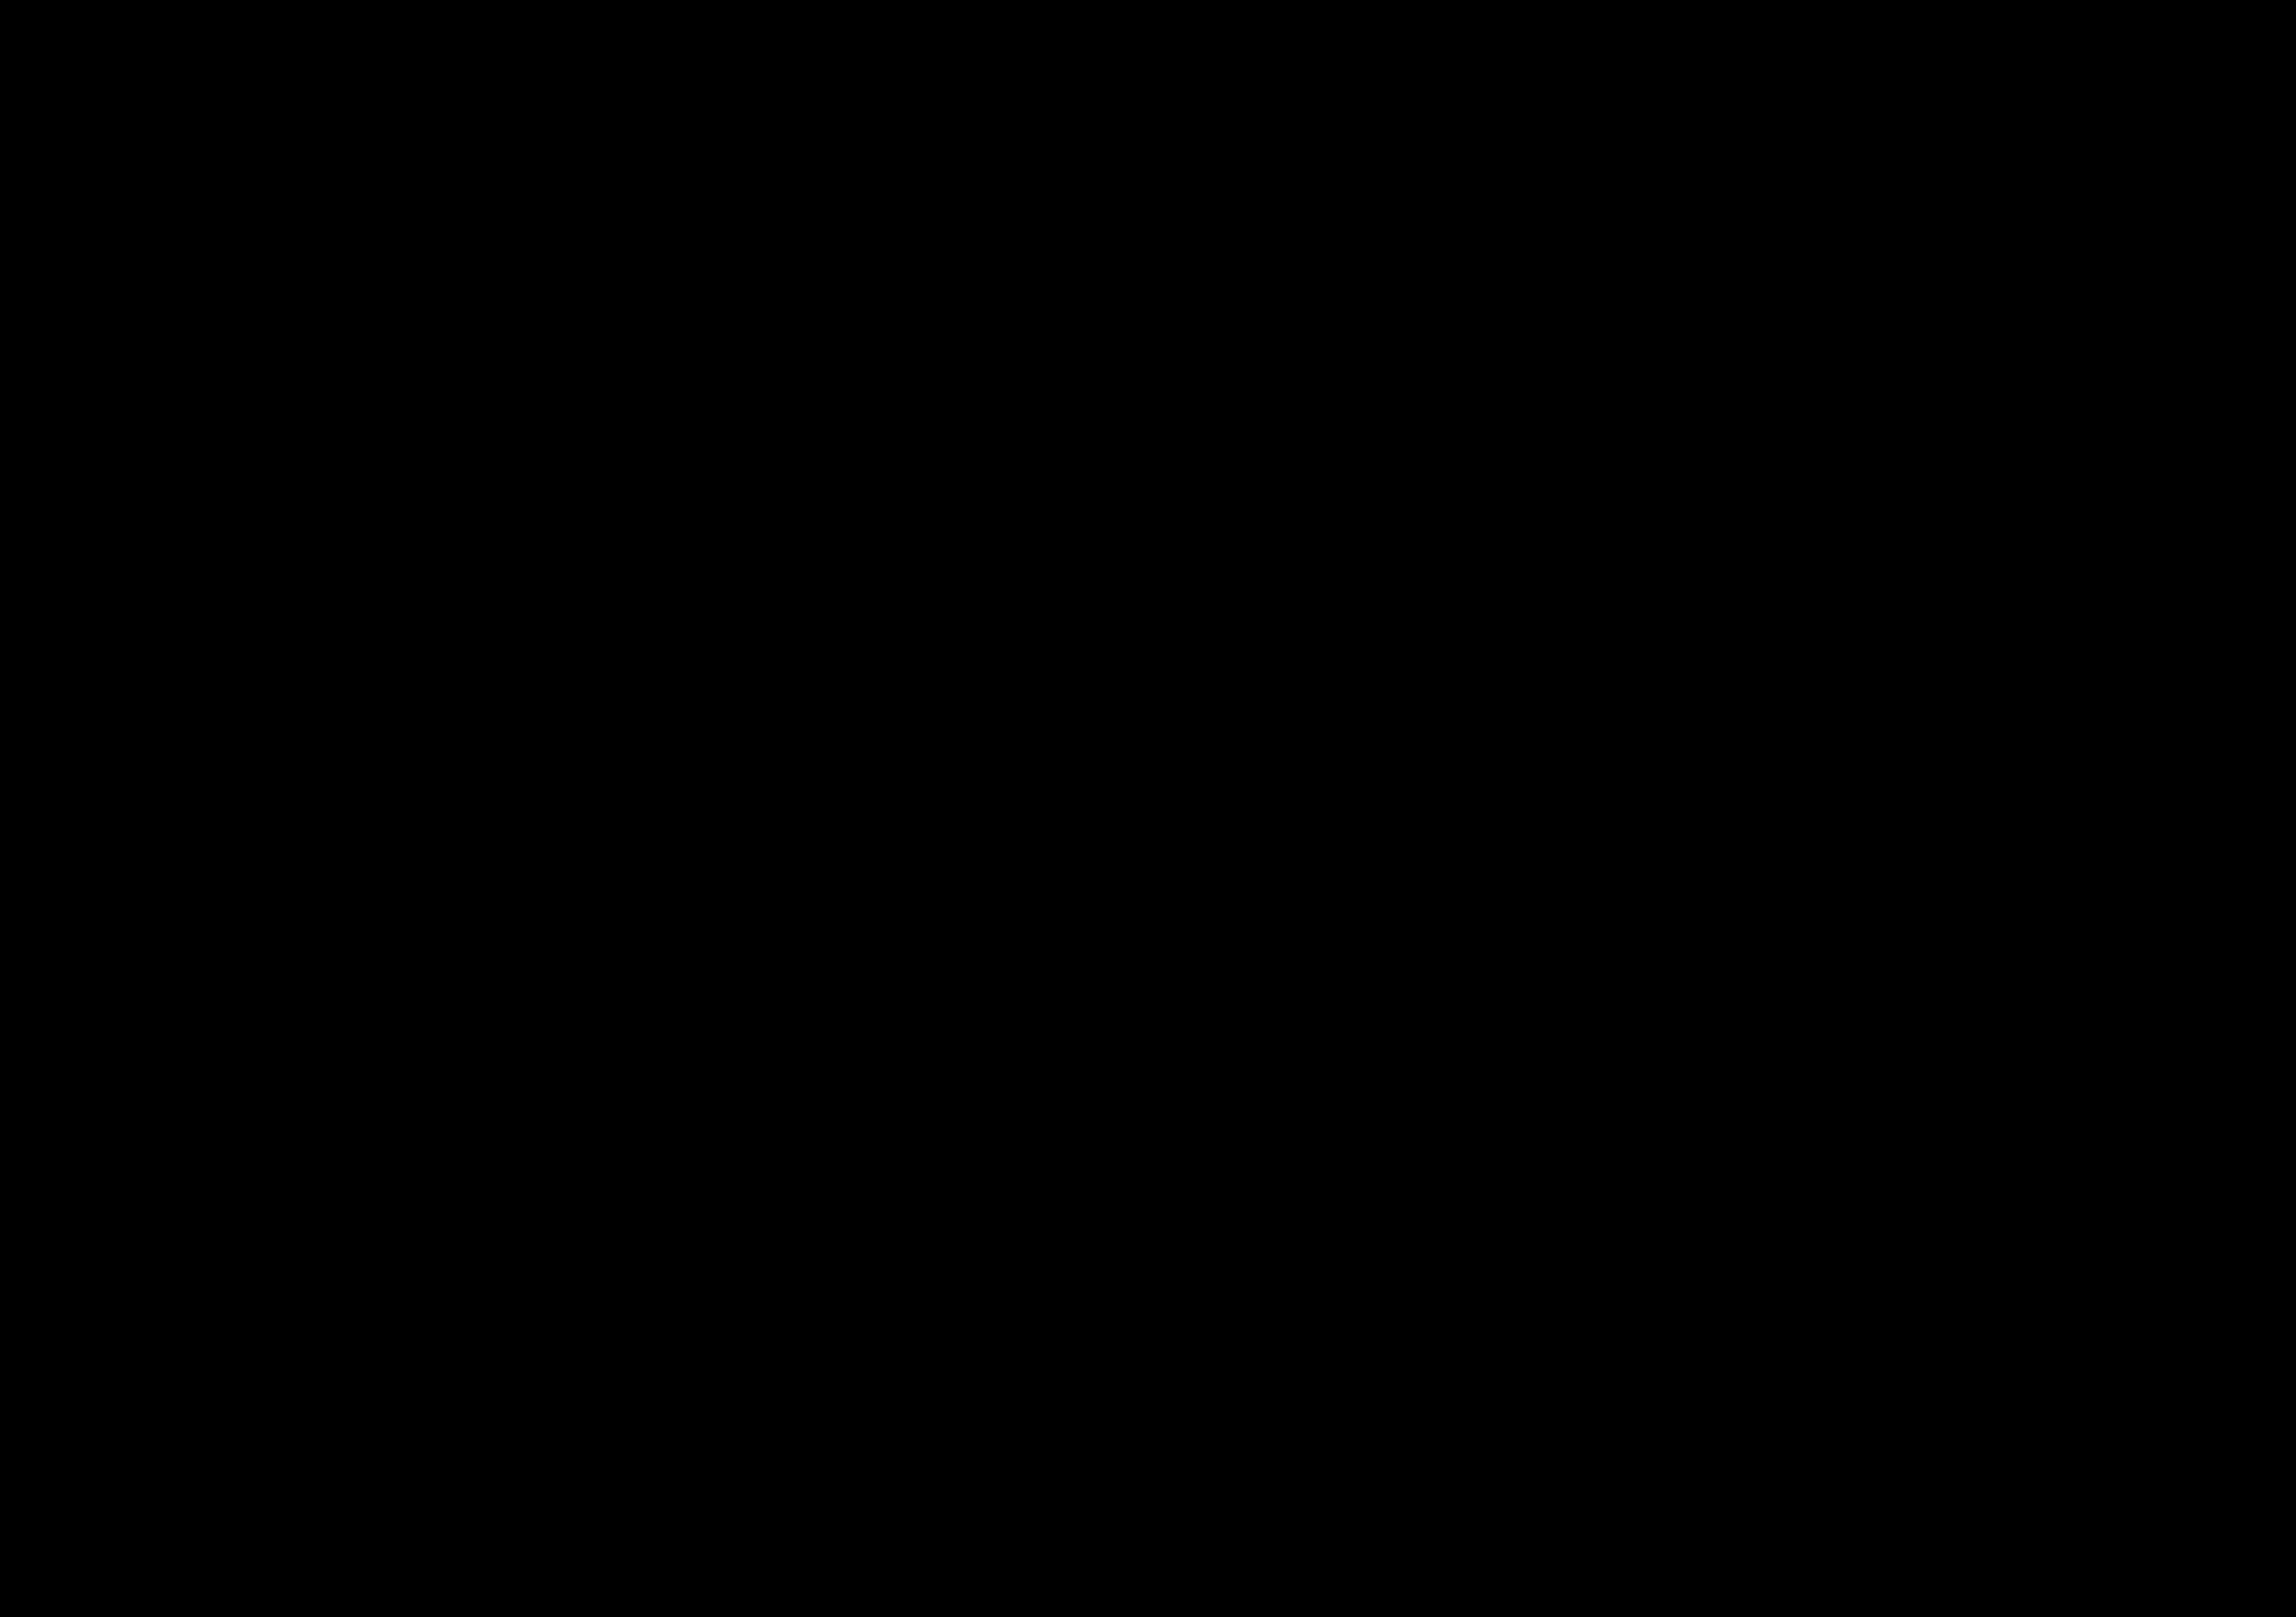 281 founder Logos(1).png